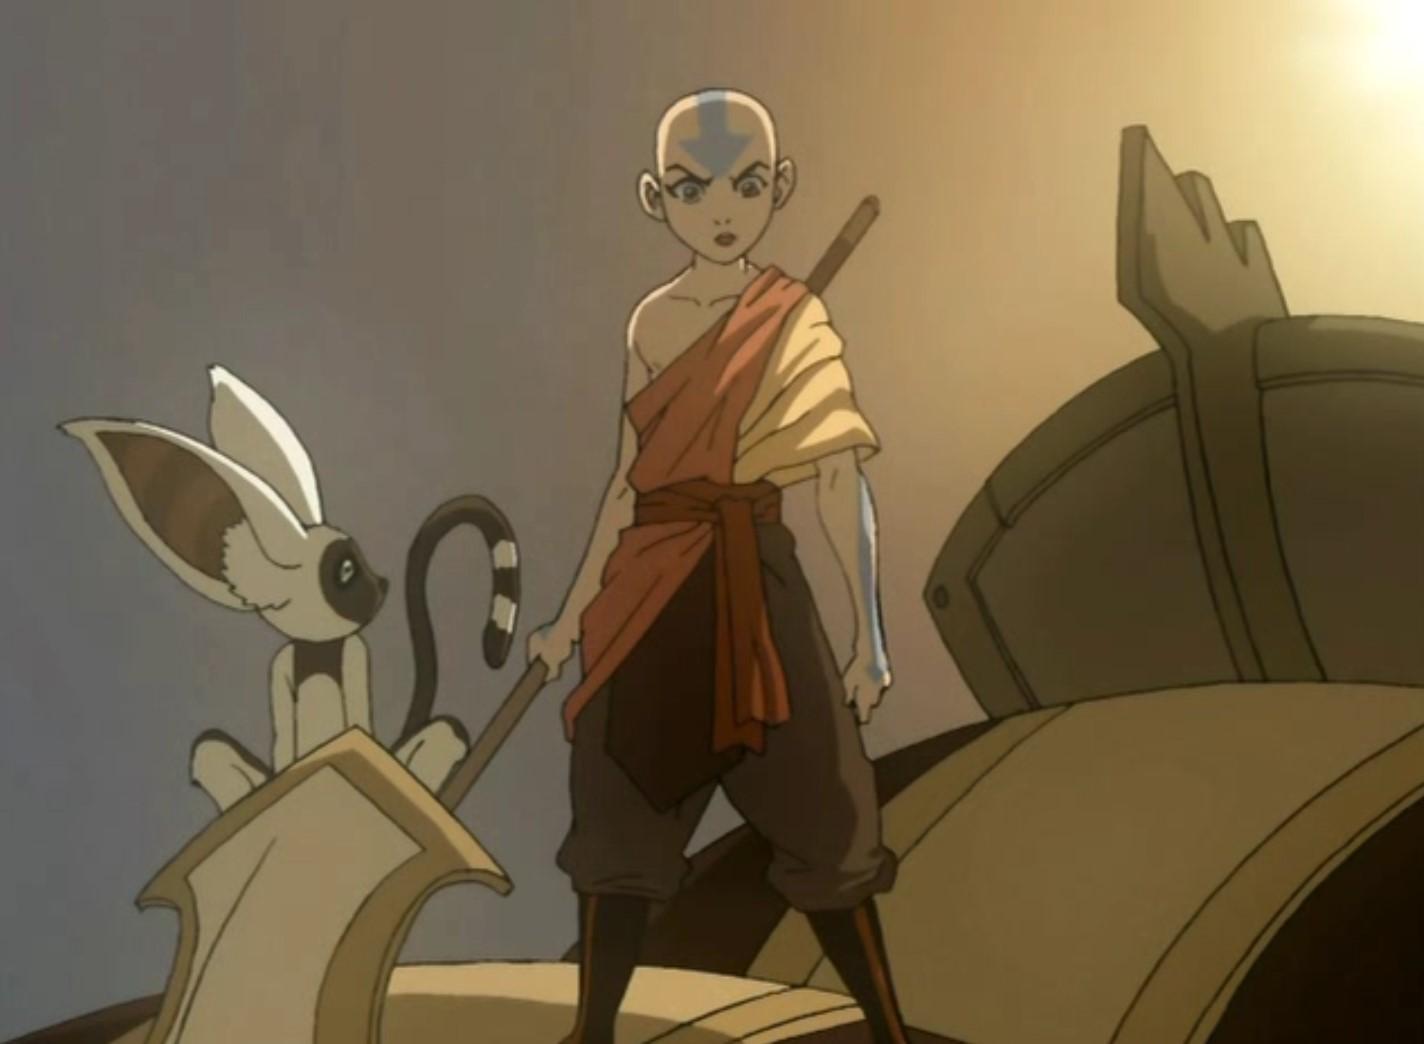 Avatar: A Lenda de Aang – Episódio 51 Dublado – O Dia do Sol Negro, 2ª Parte: O Eclipse